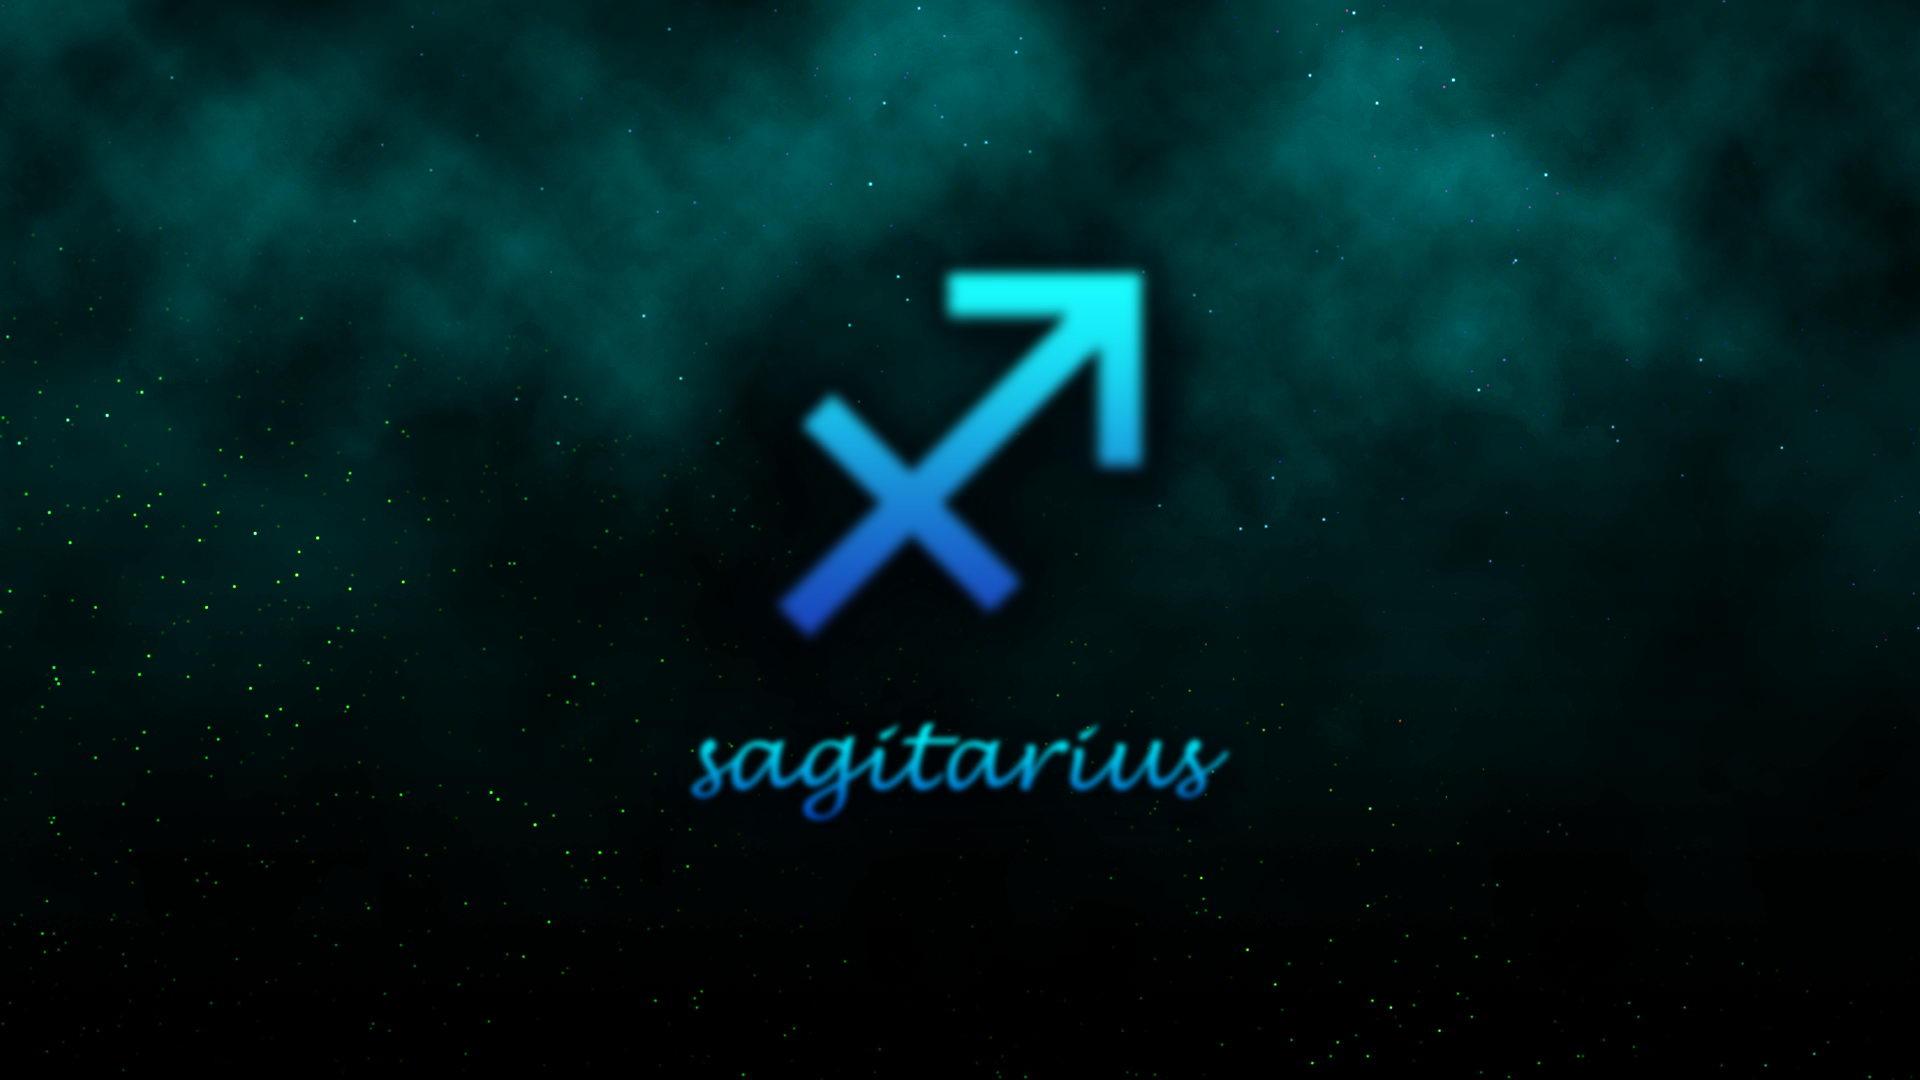 Scorpio Car Wallpapers Free Download Sagittarius Background Wallpaper High Definition High